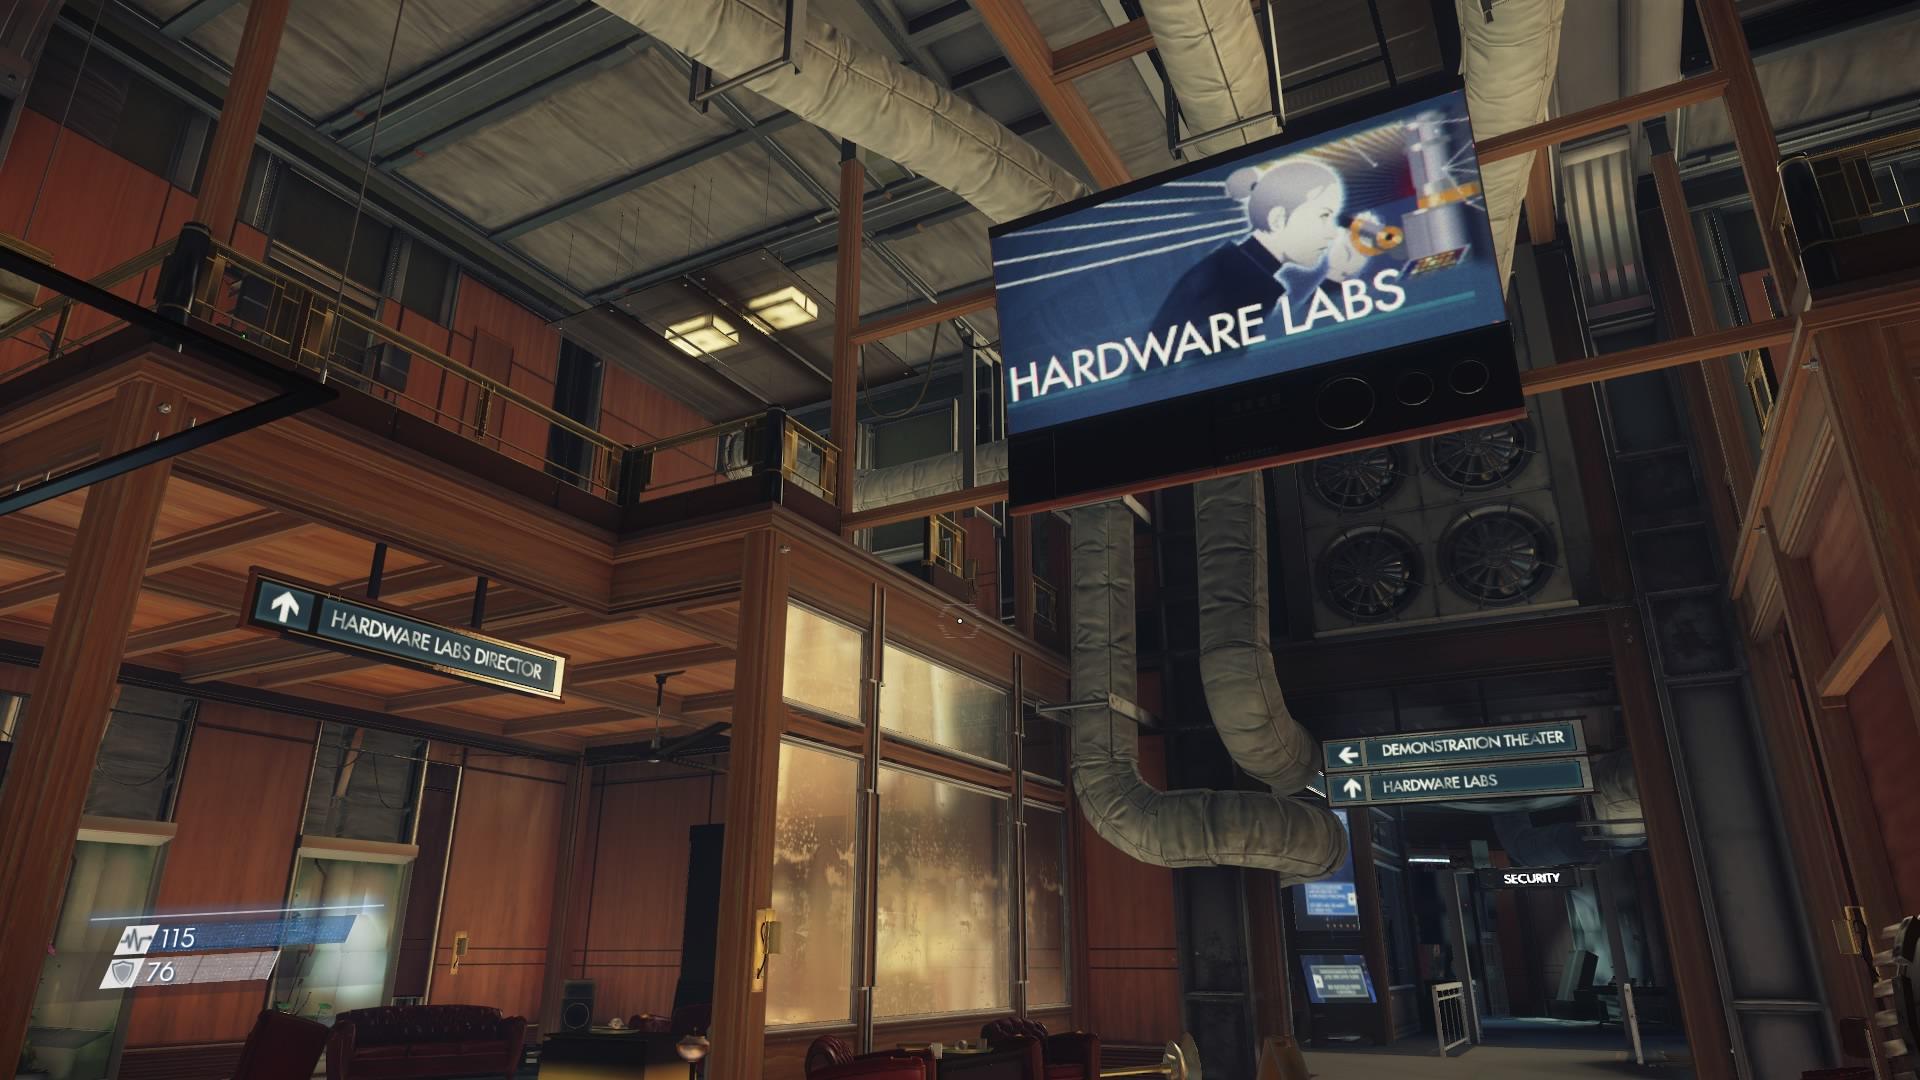 Hardware Labs